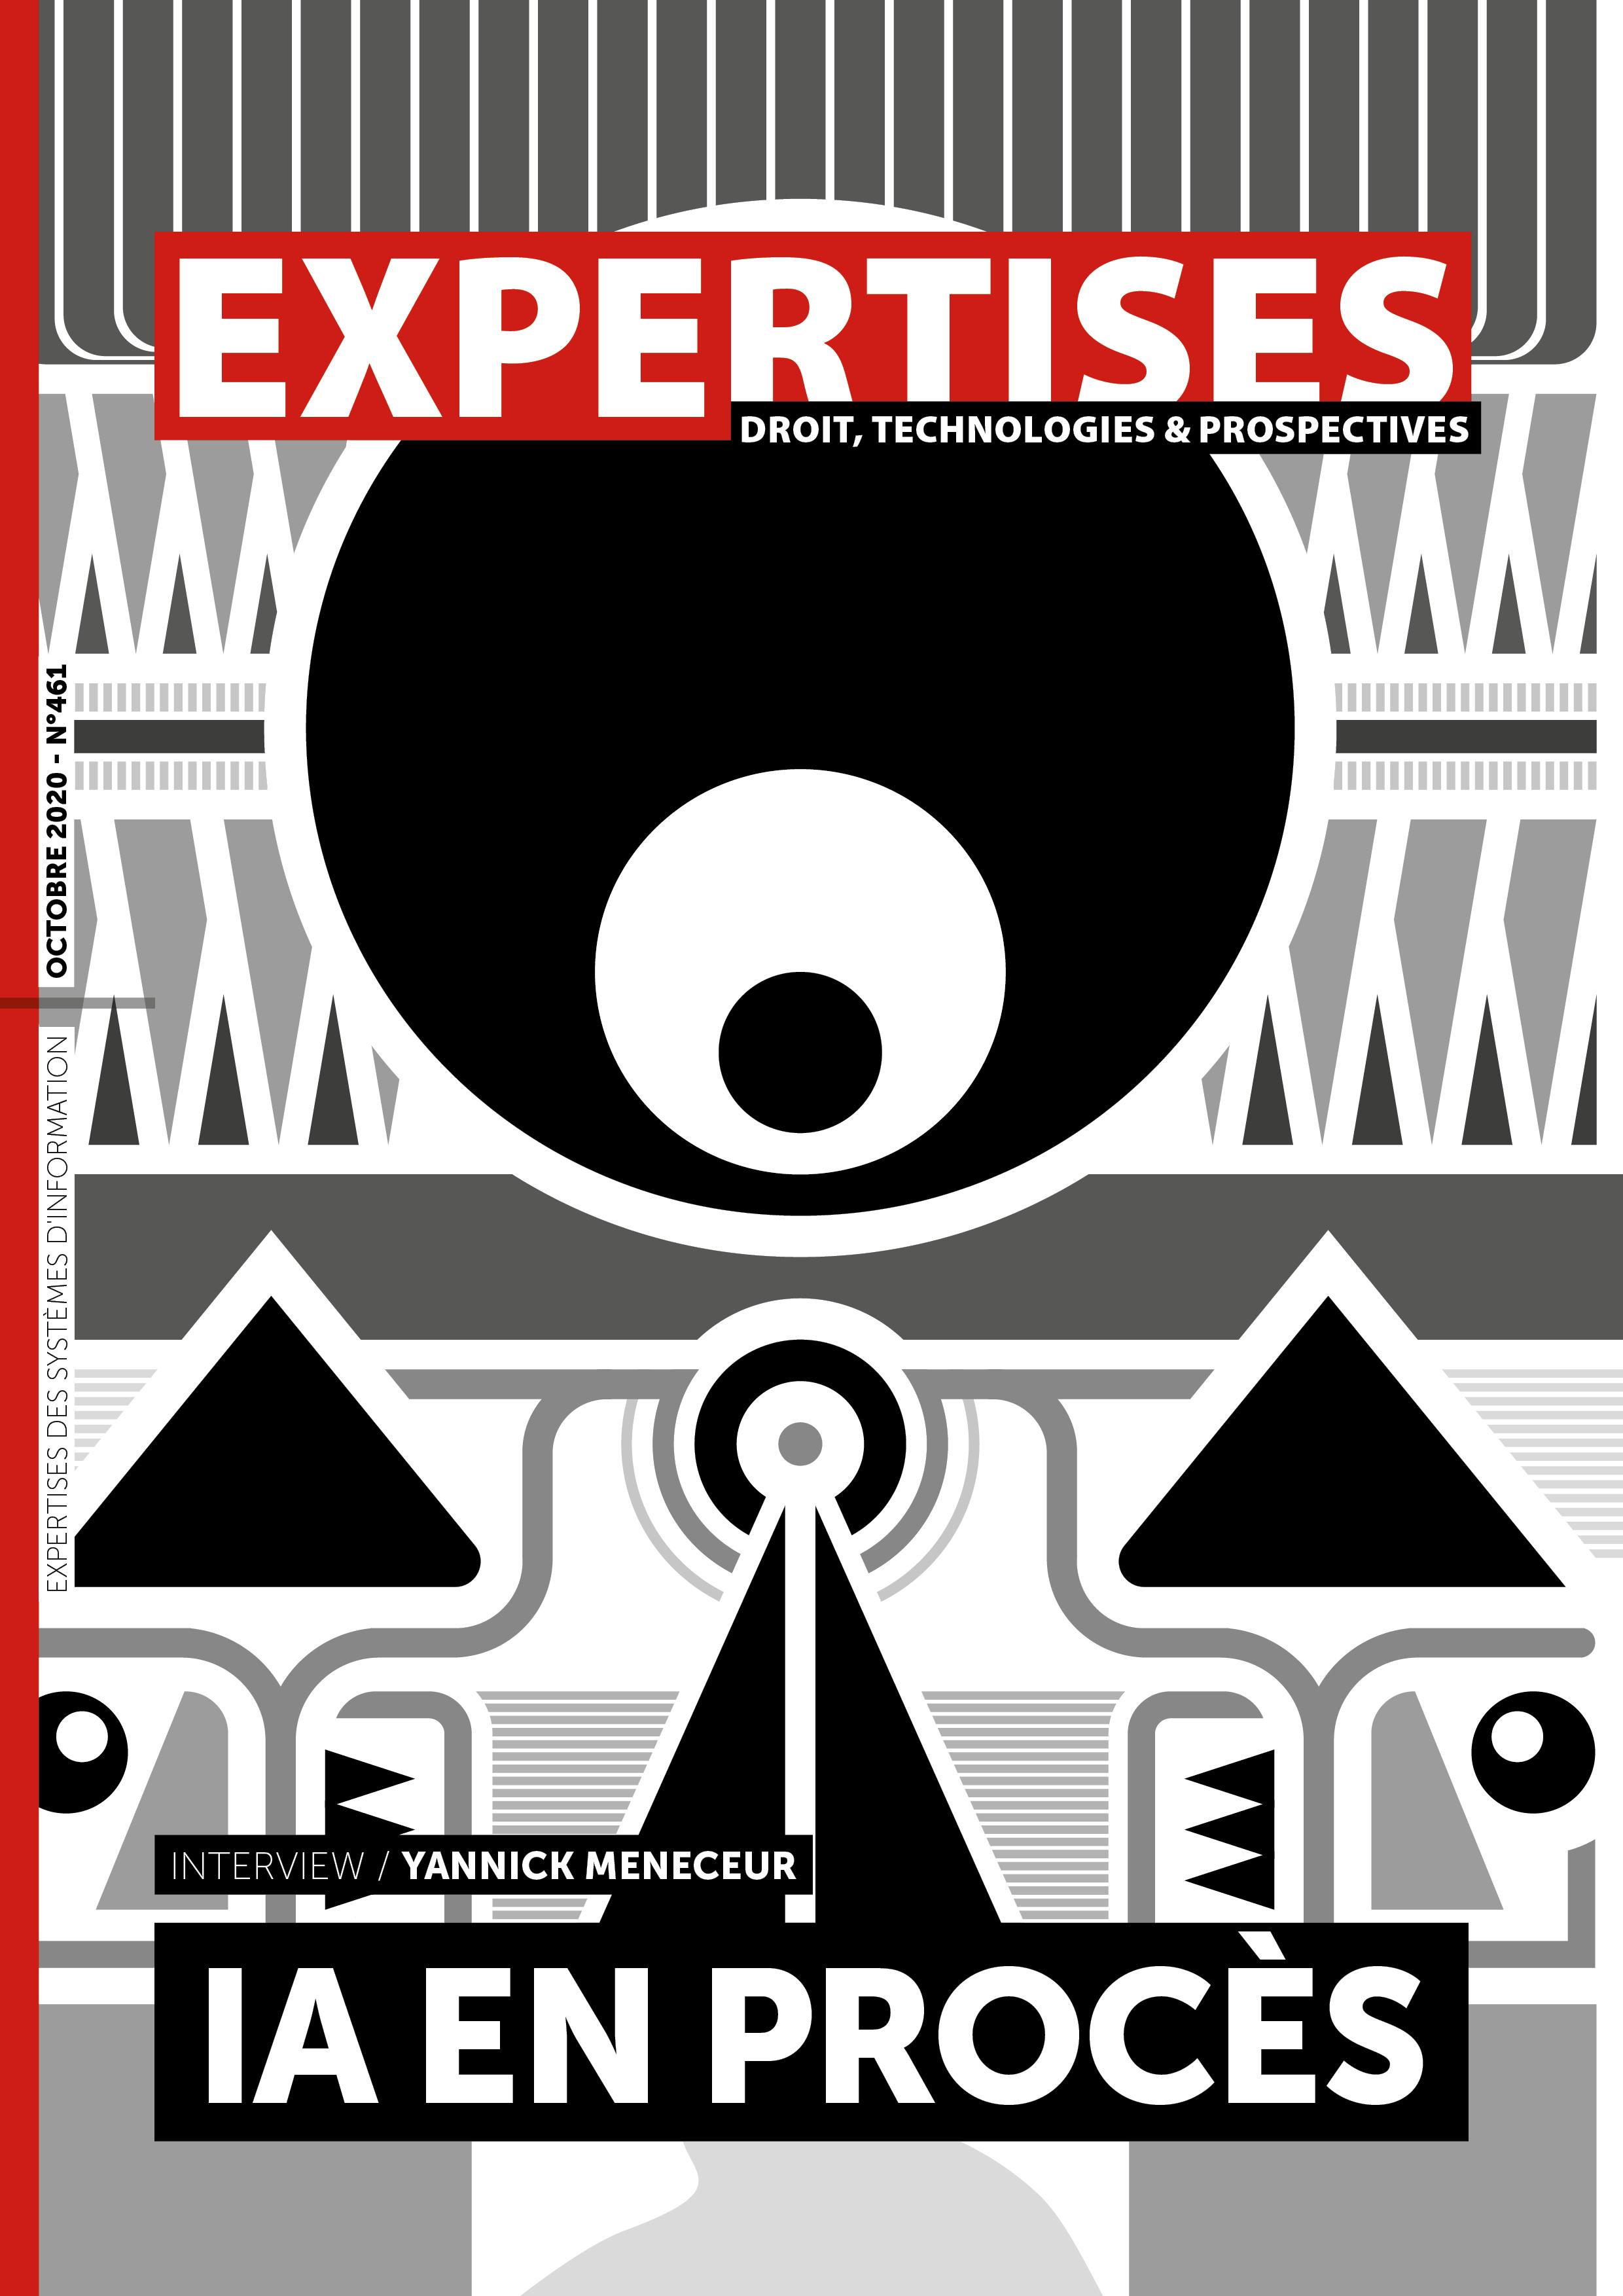 EXPERTISES N°461 - octobre 2020 - IAen procès / Yannick Meneceur